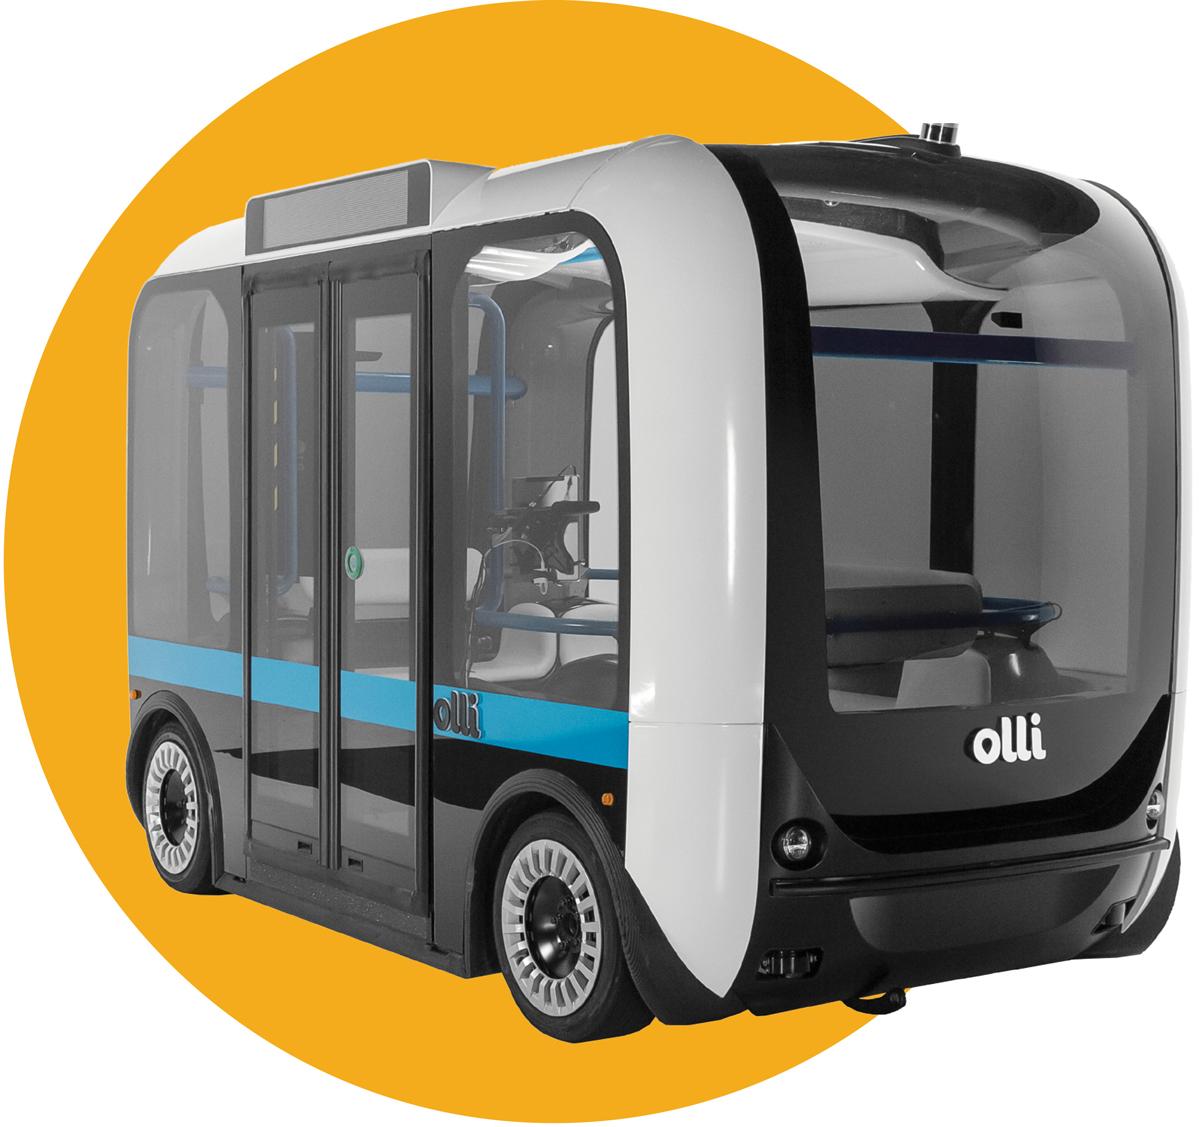 IBM's Olli